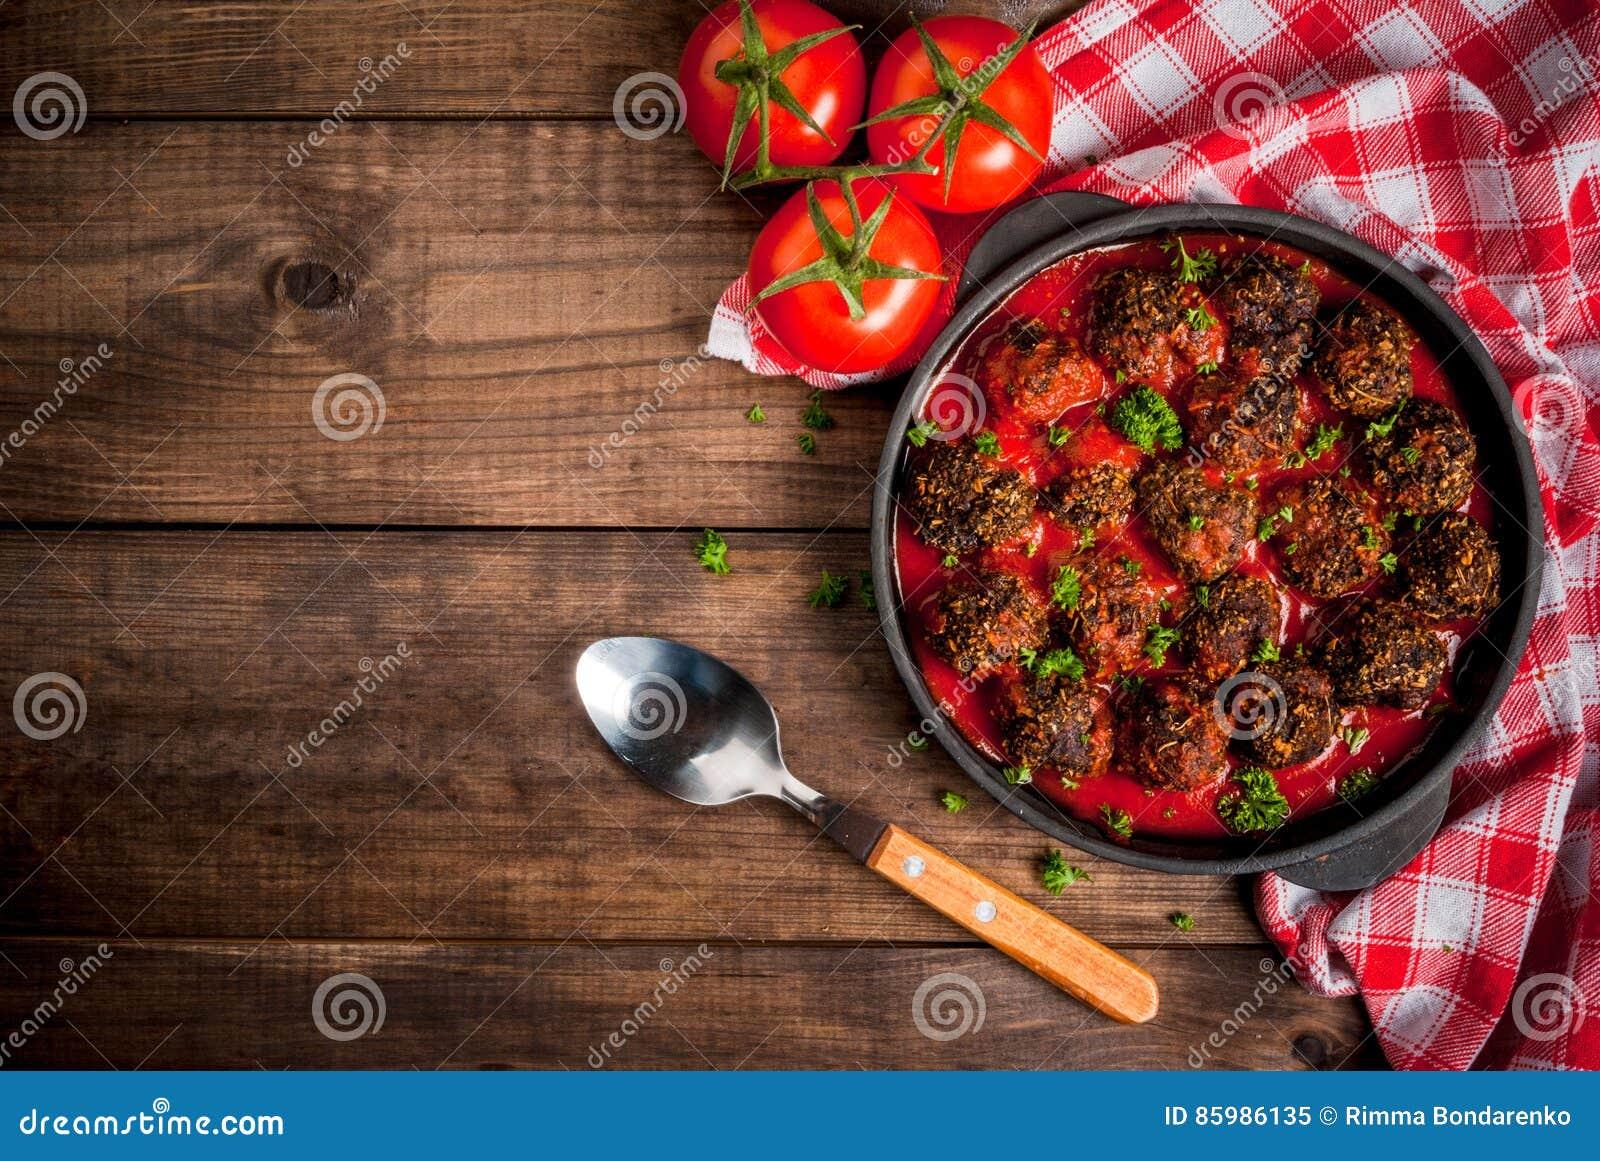 Eigengemaakte fijngehakte rundvleesvleesballetjes